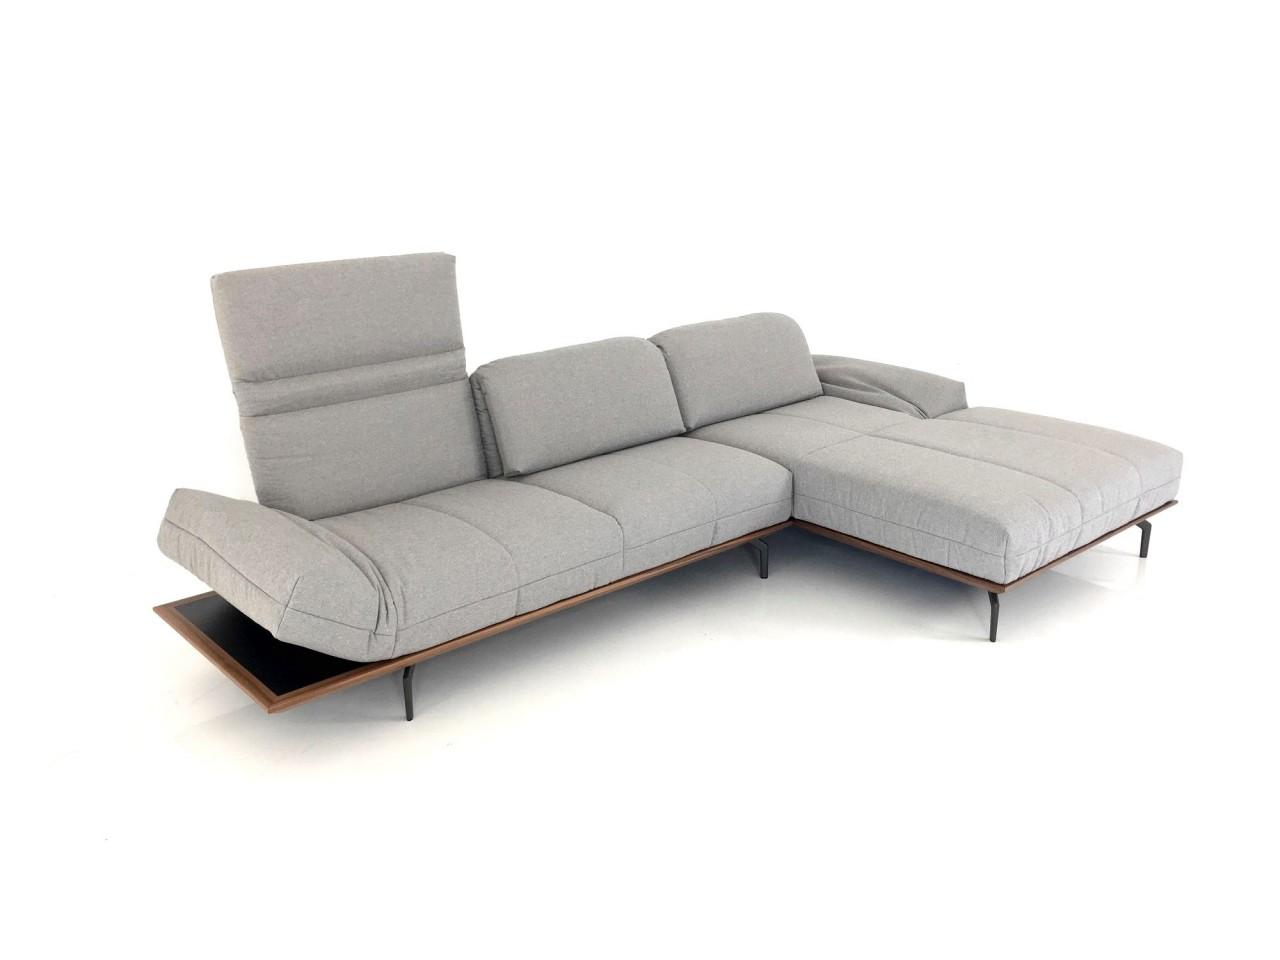 recamiere sofa barock recamiere wei velours rot with recamiere sofa cancan sofa recamiere seat. Black Bedroom Furniture Sets. Home Design Ideas